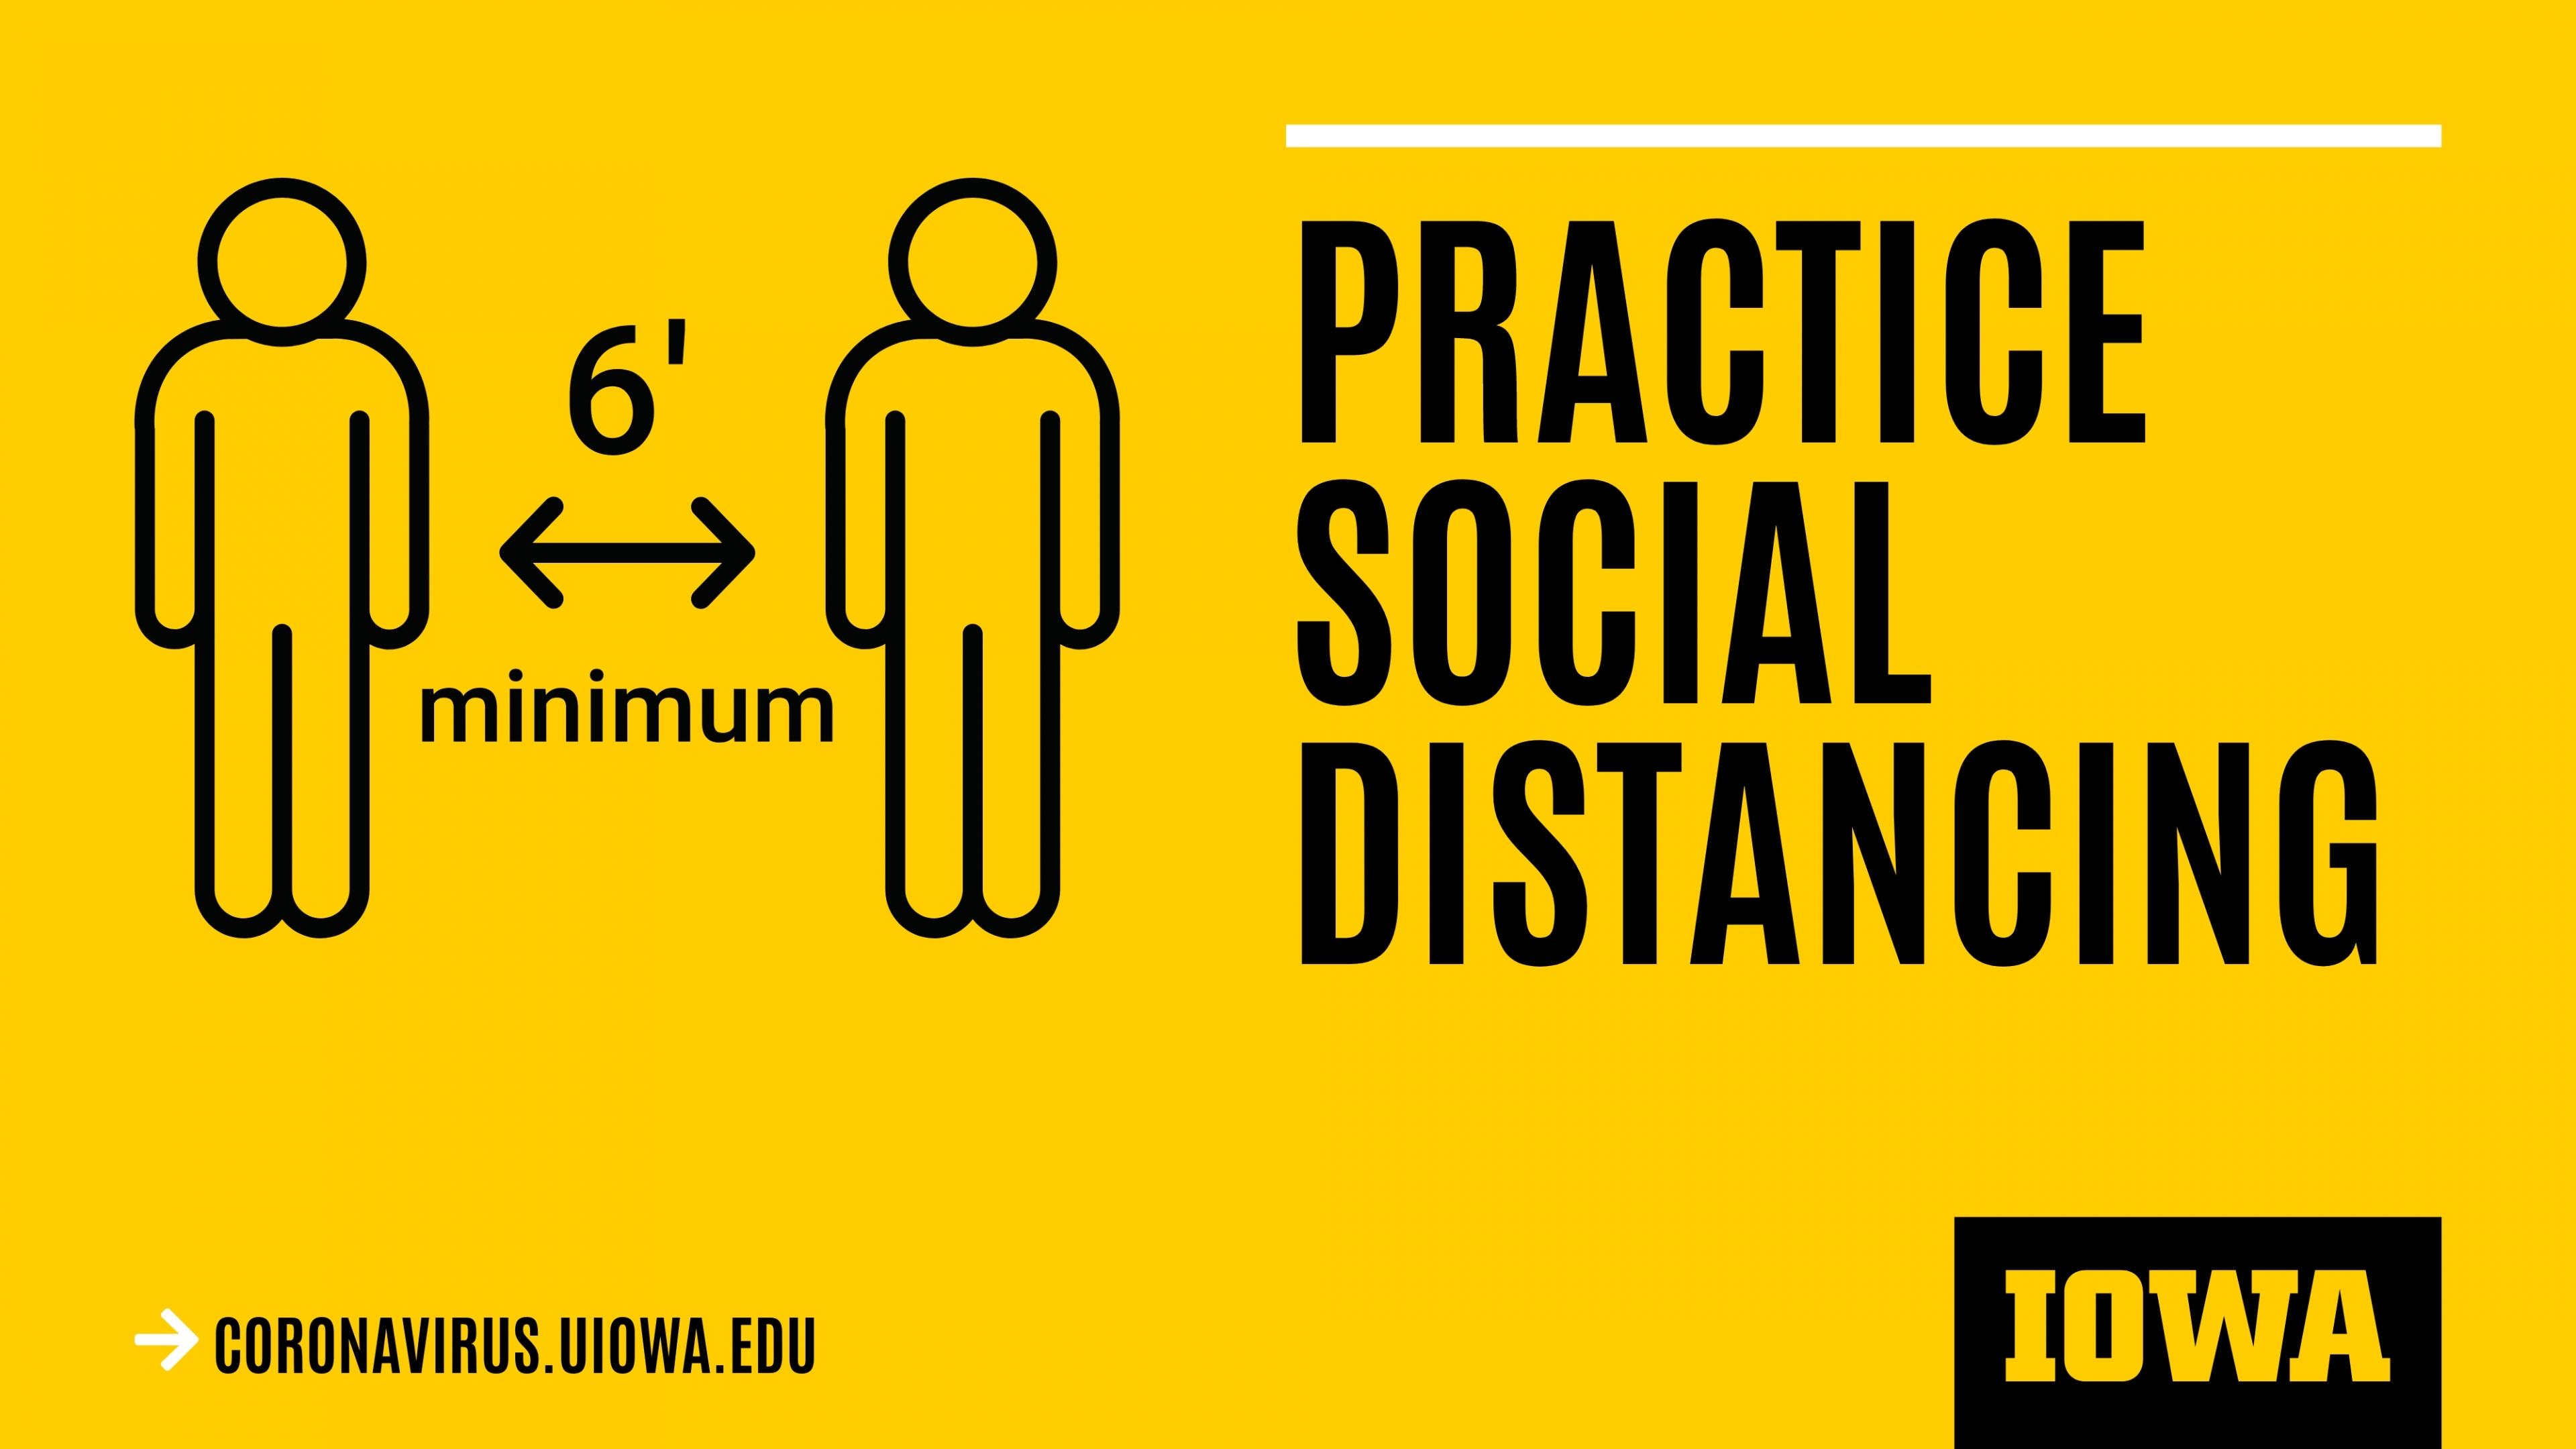 Practice social distancing of 6 feet minimum